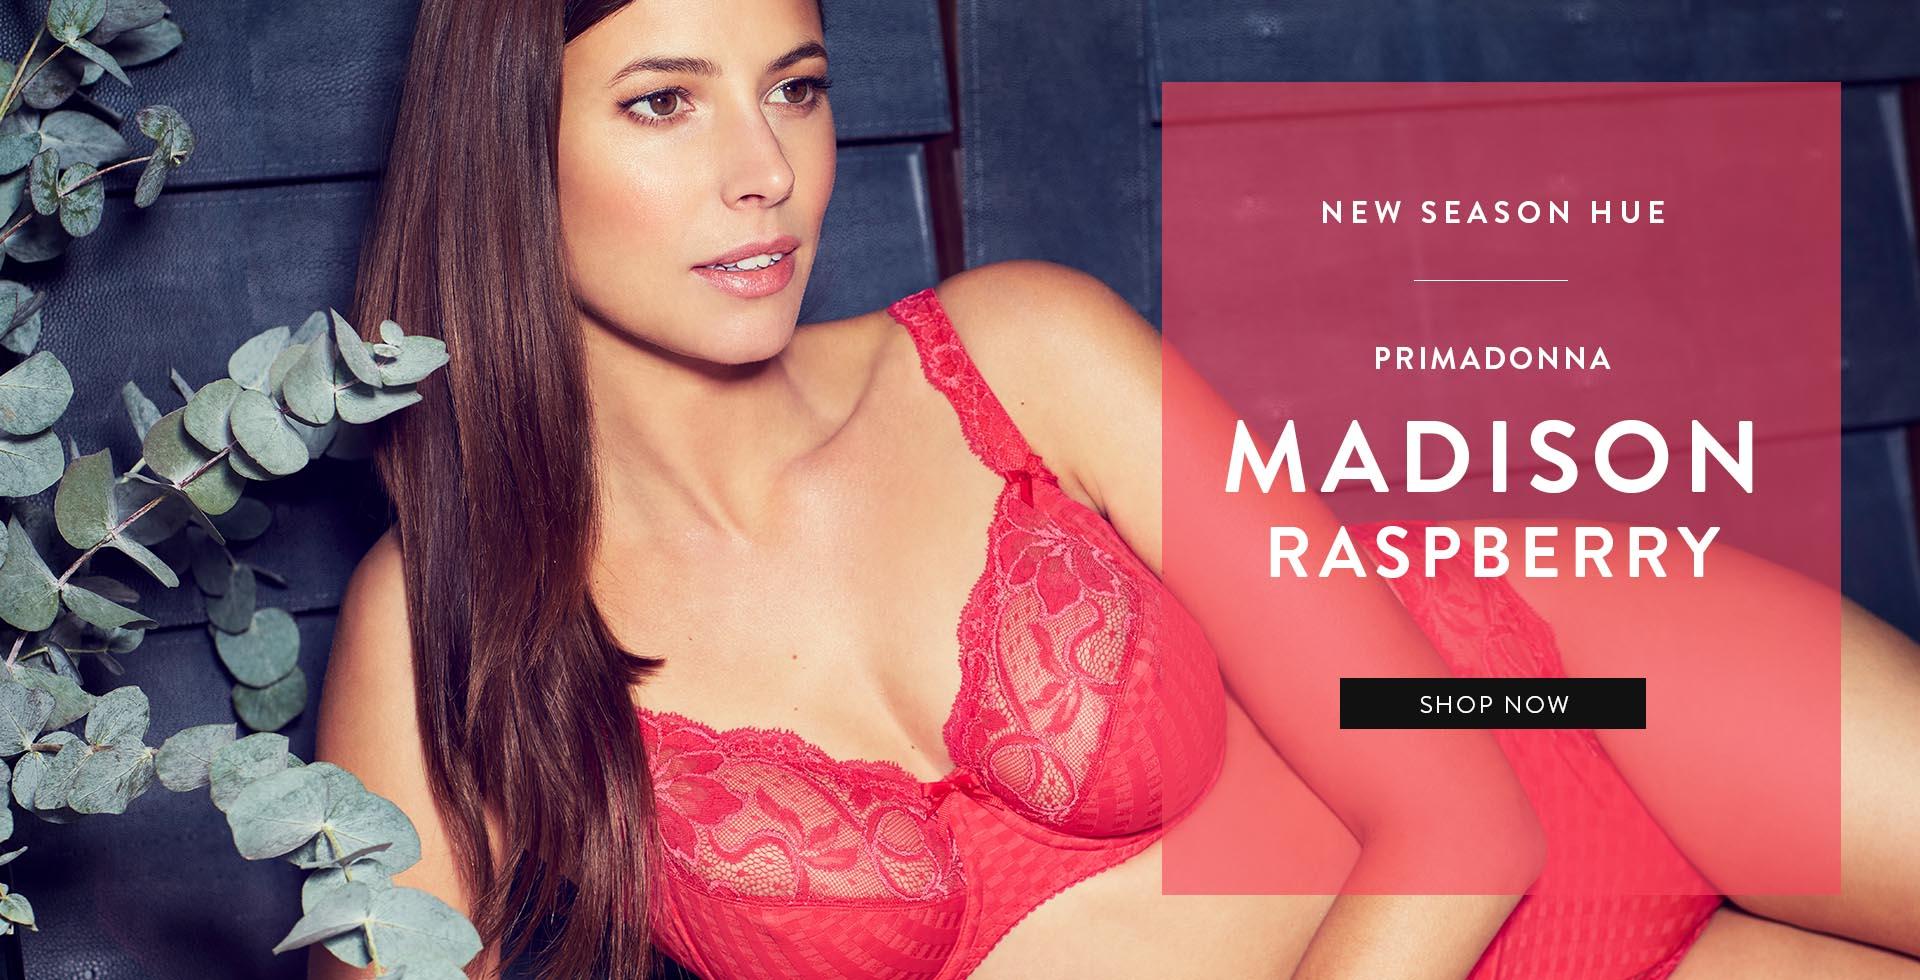 Shop Rigby & Peller's Primadonna Madison Bra in Raspberry